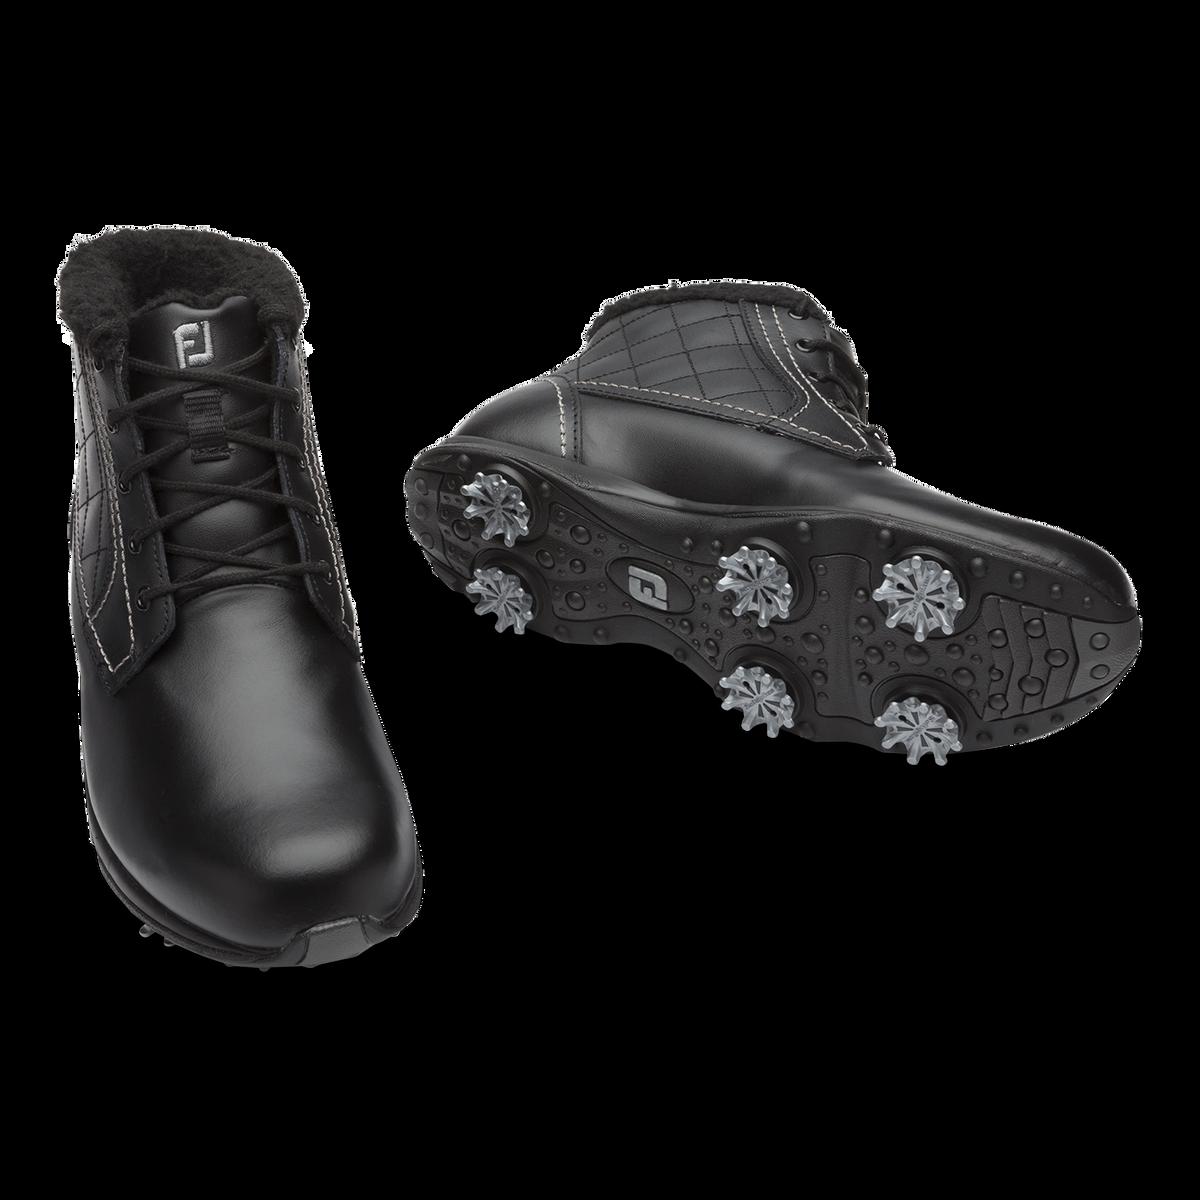 24++ Ladies winter golf boots size 6 info